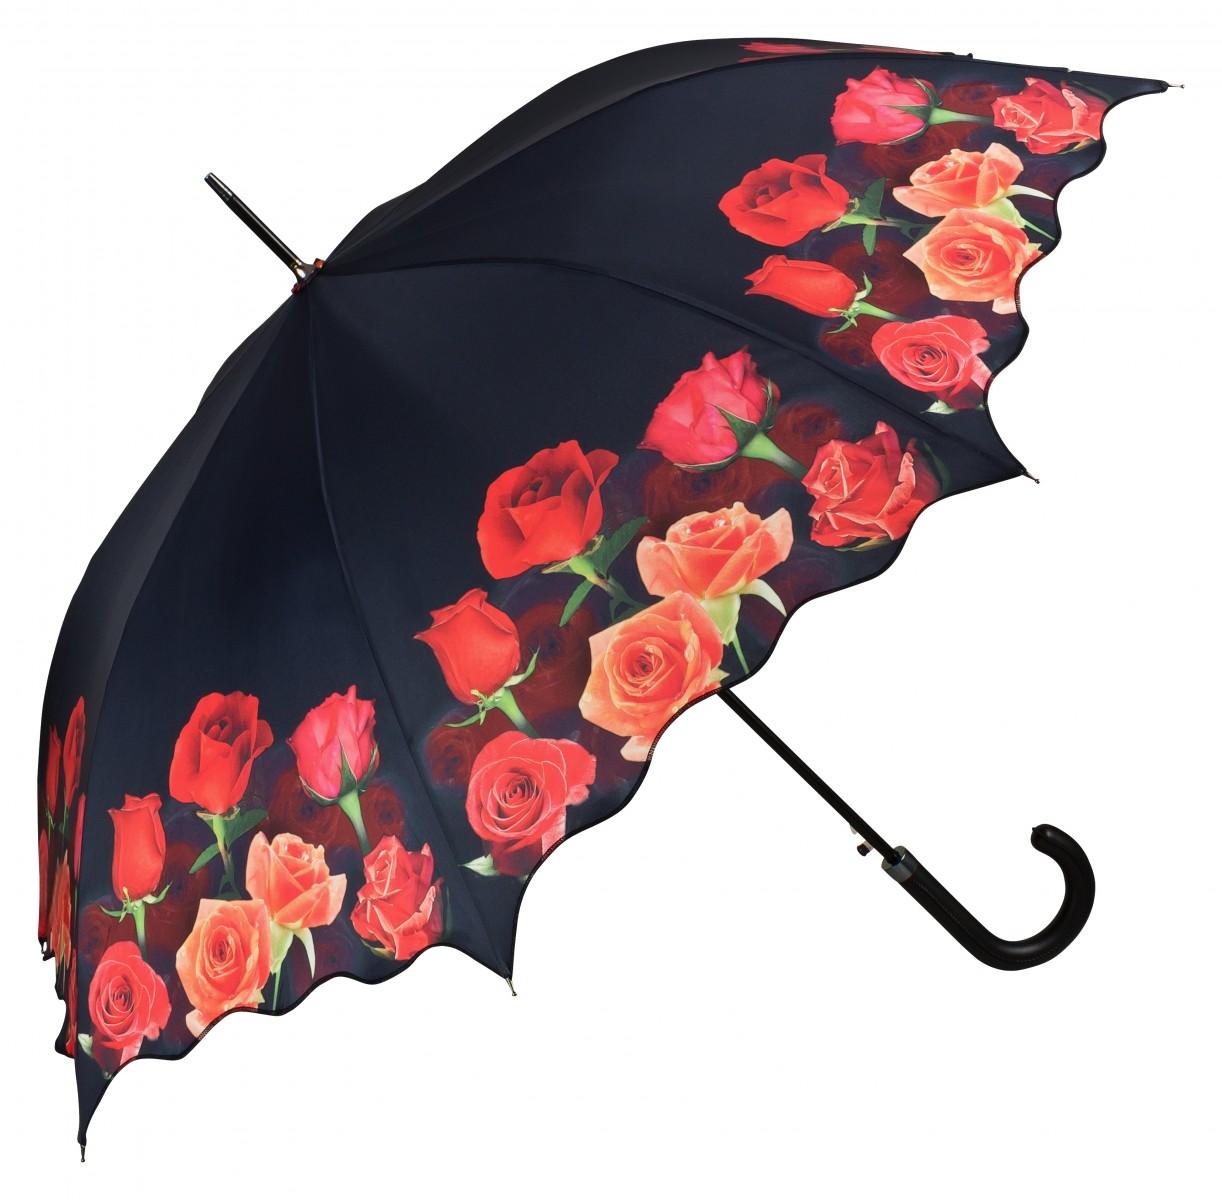 Regenschirm Stockschirm Rosenbouquet